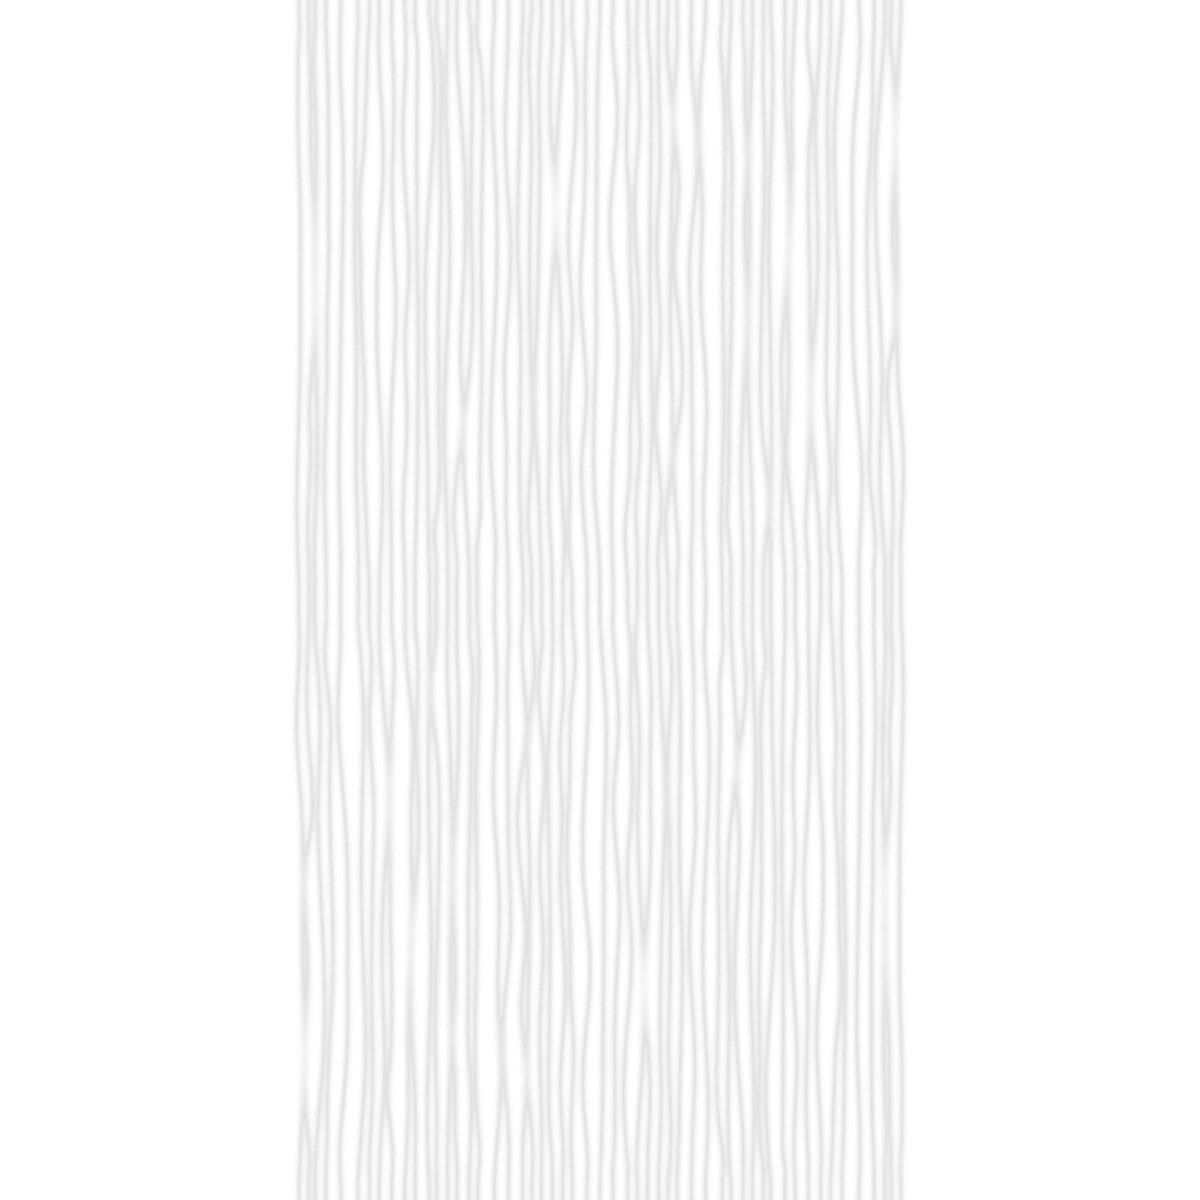 Lines Lux Inox Lappato 12x24 W00014